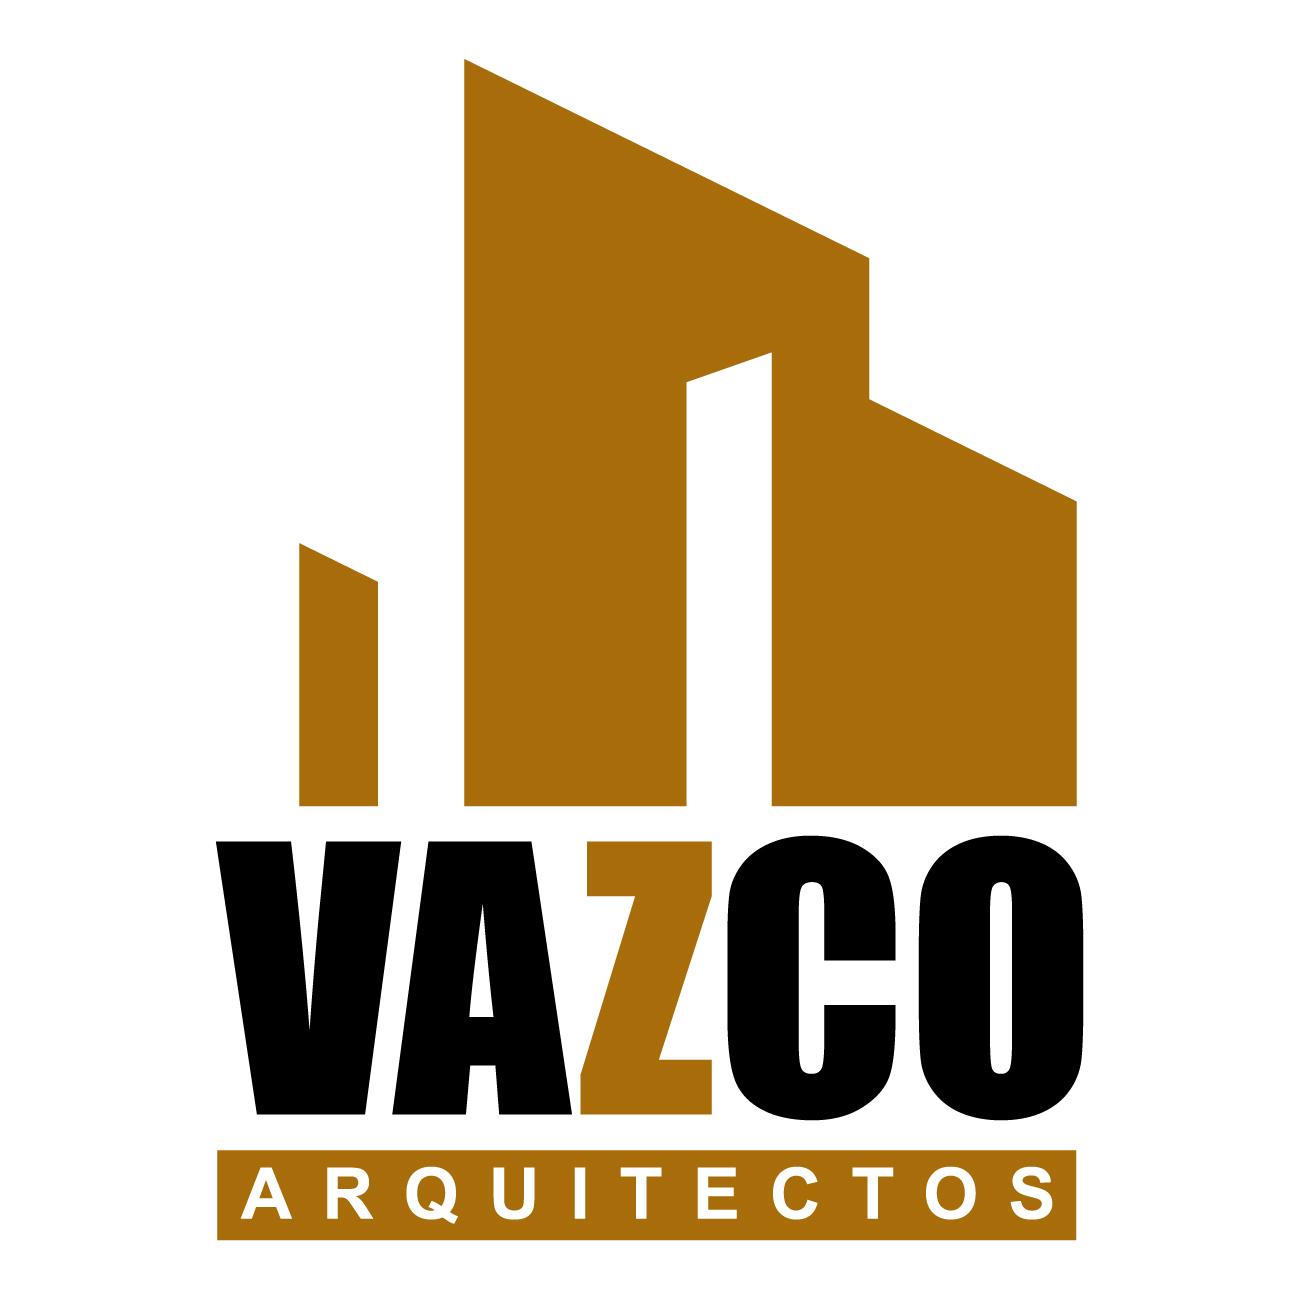 Vazco Arquitectos